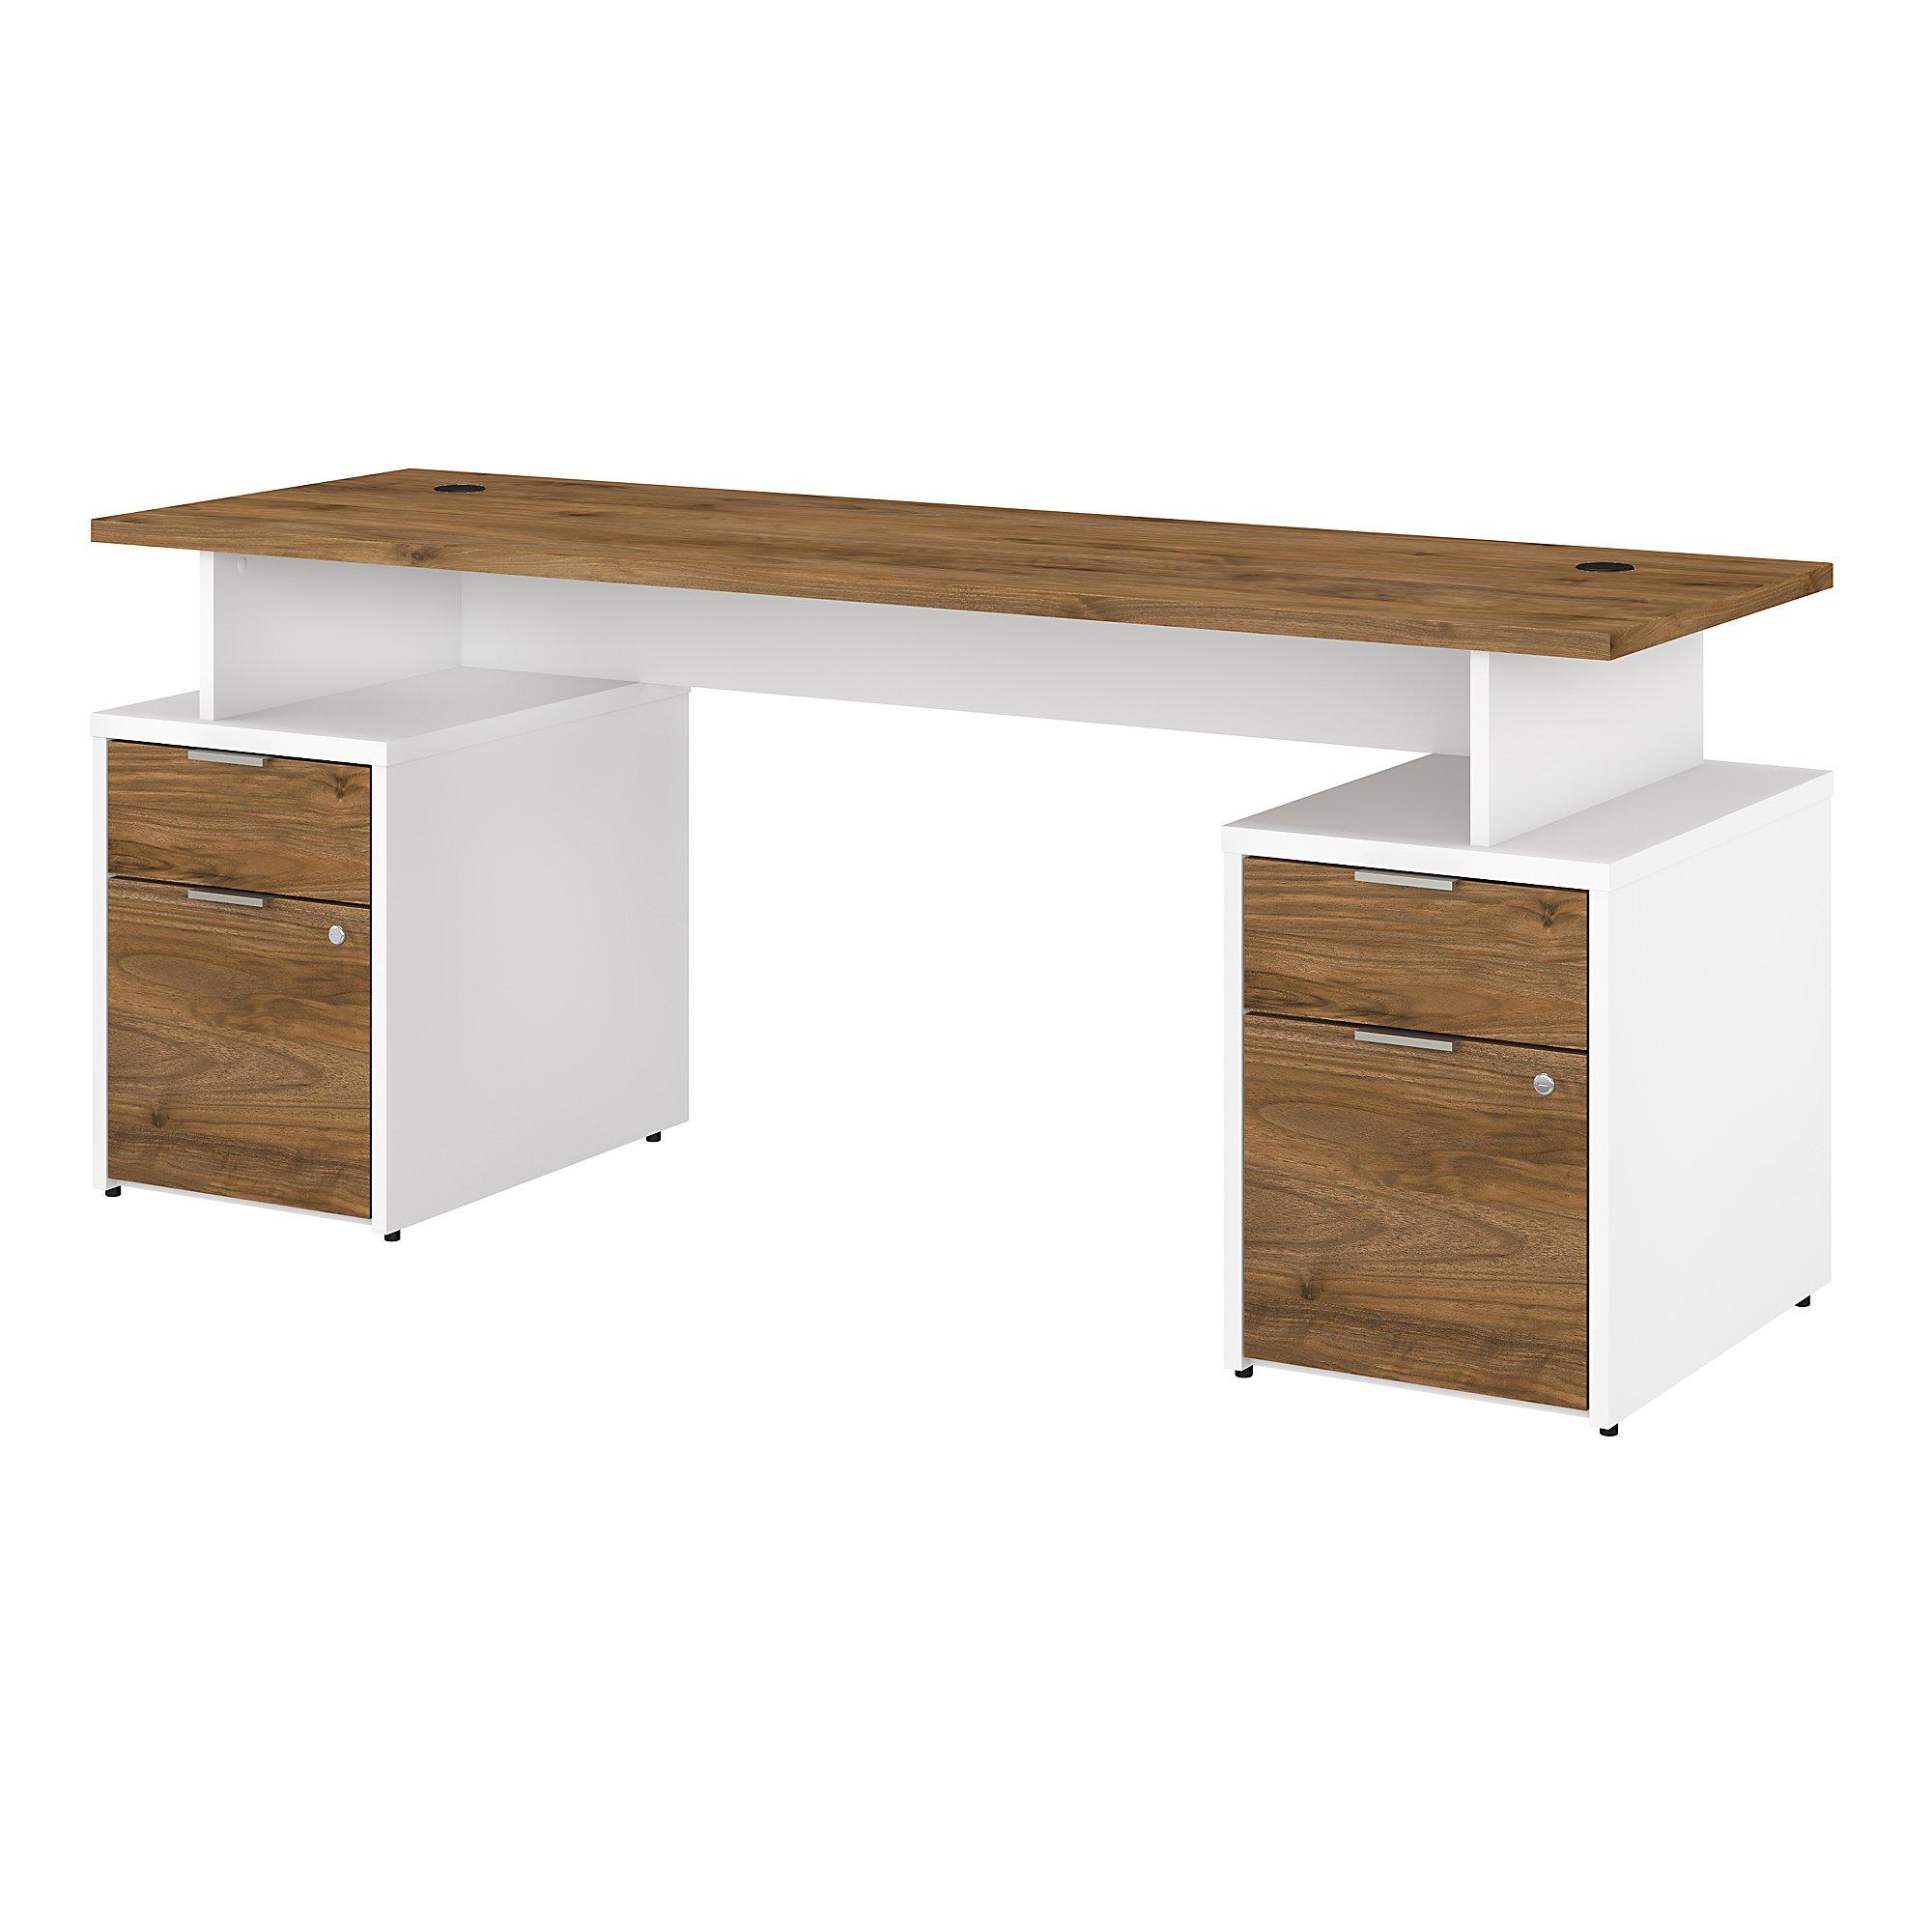 jamestown fresh walnut and white double pedestal desk